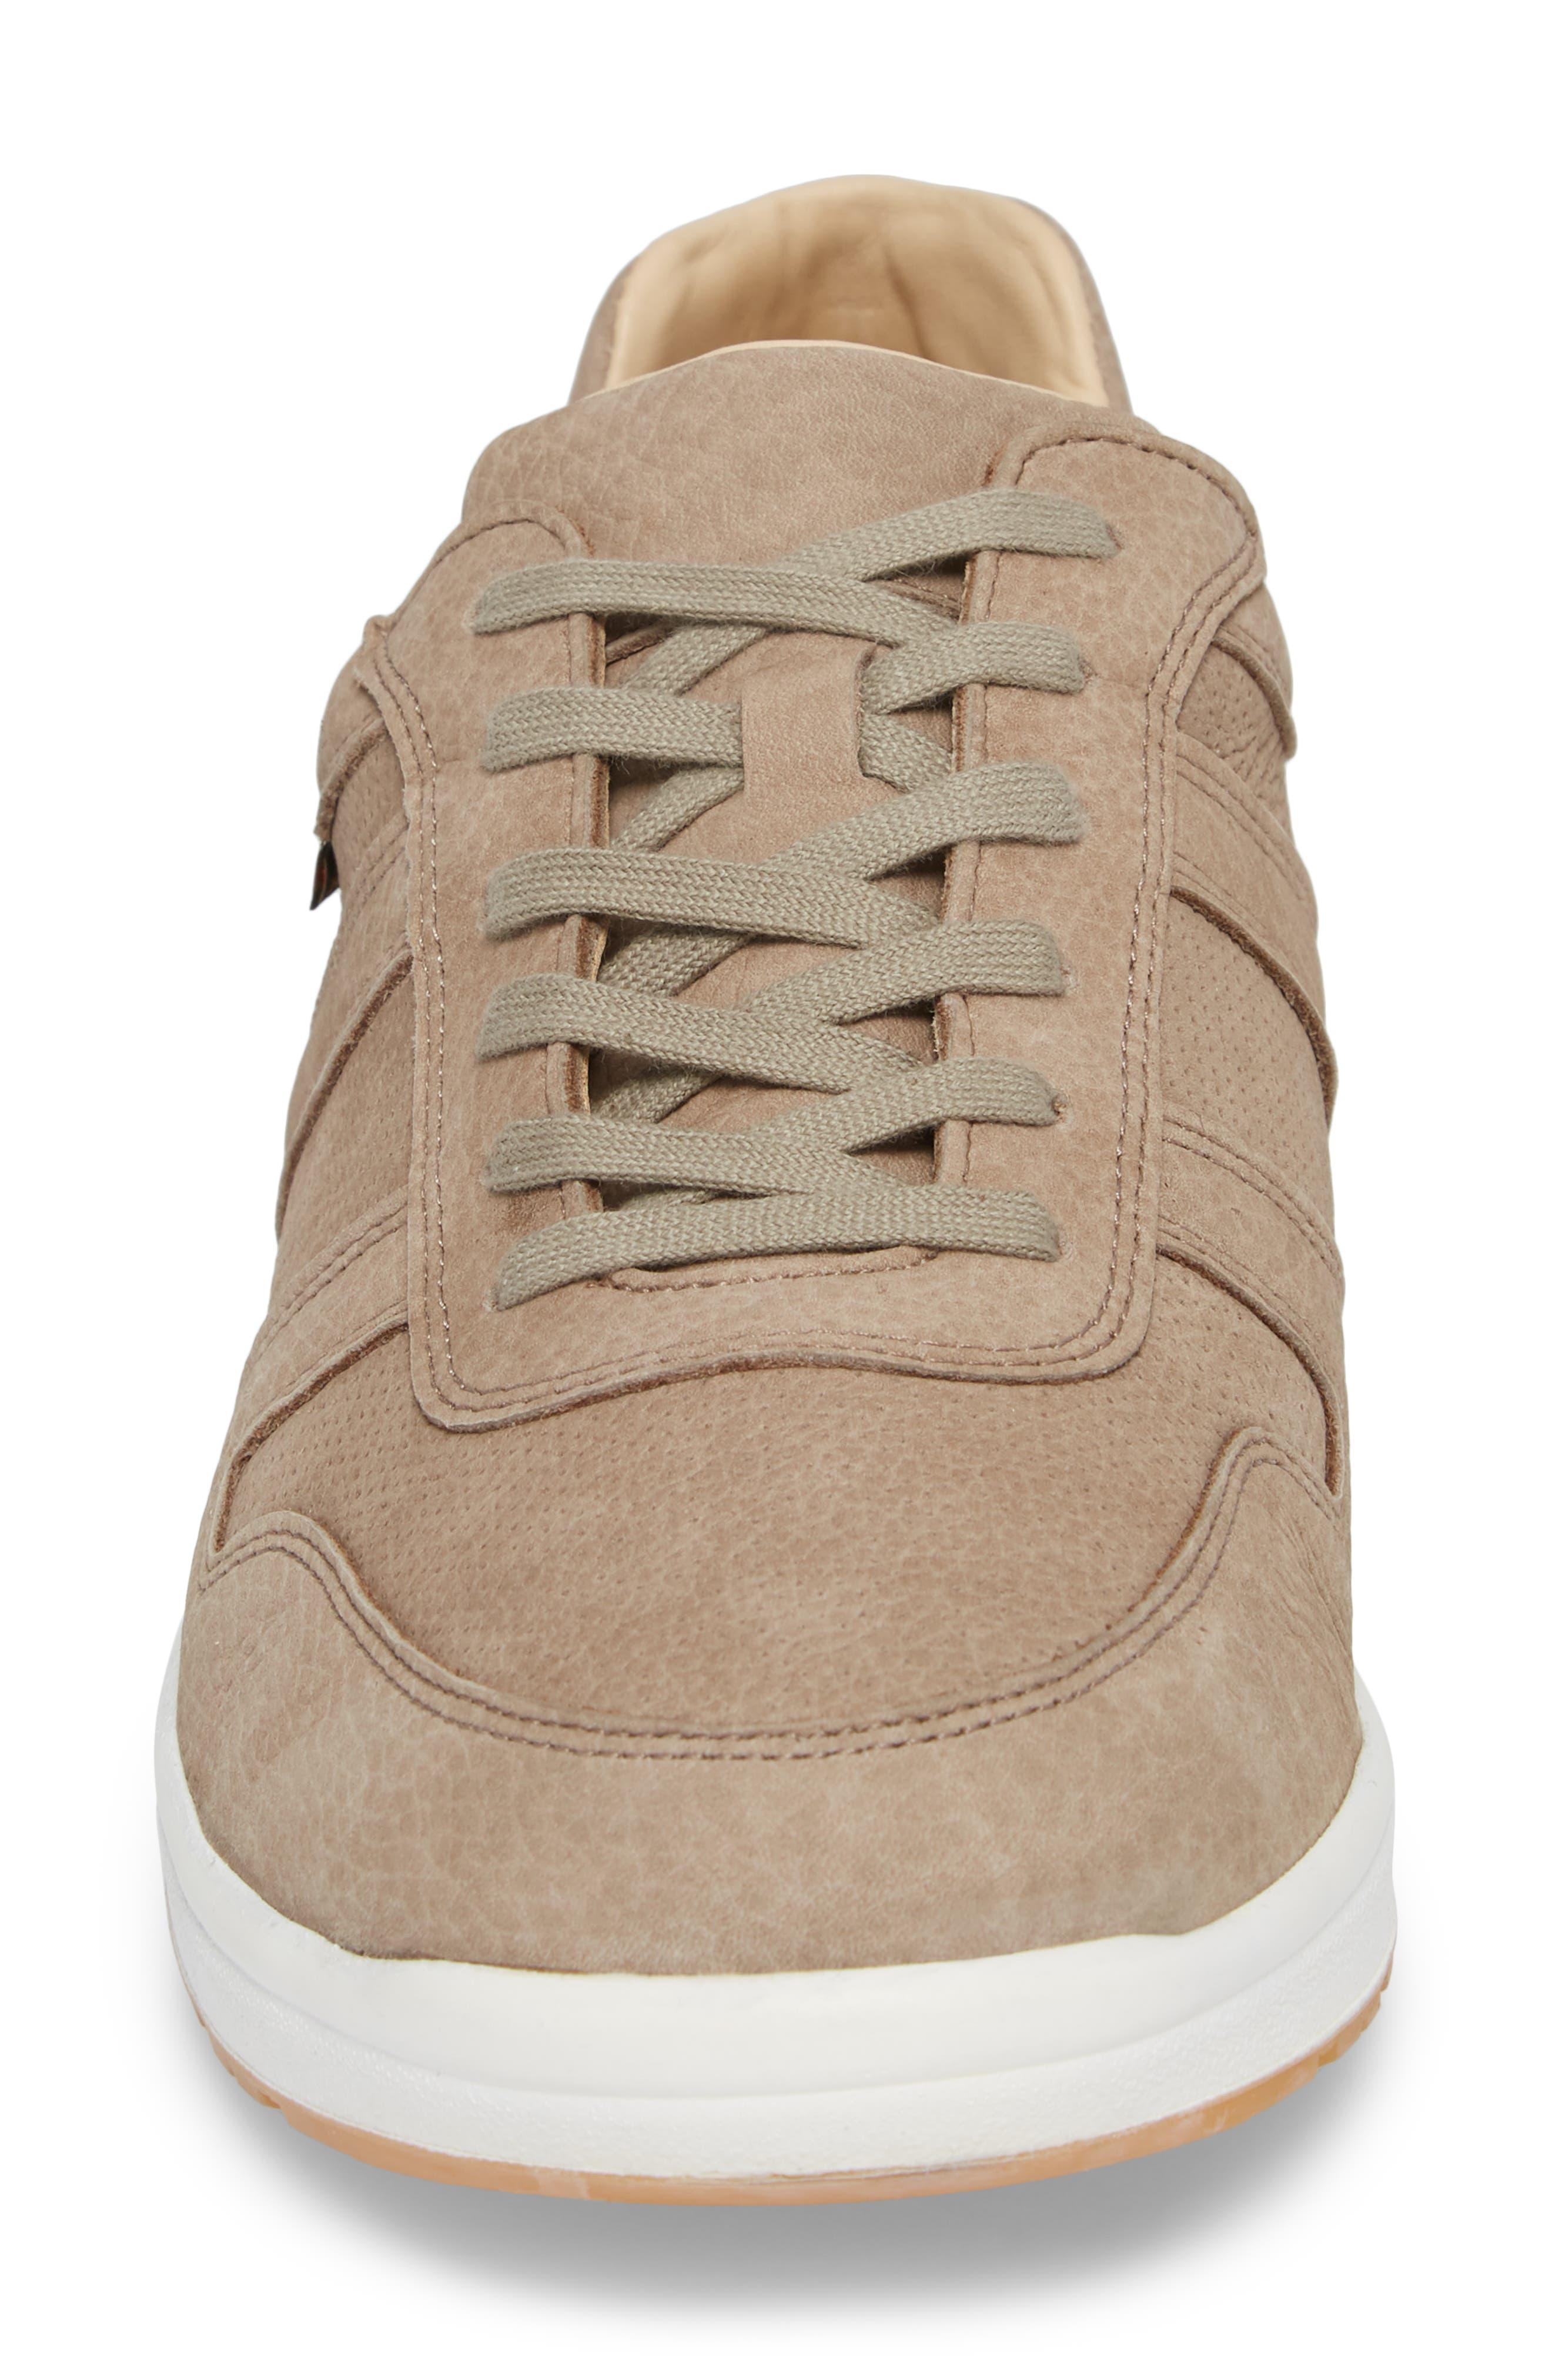 Vito Perforated Sneaker,                             Alternate thumbnail 4, color,                             281